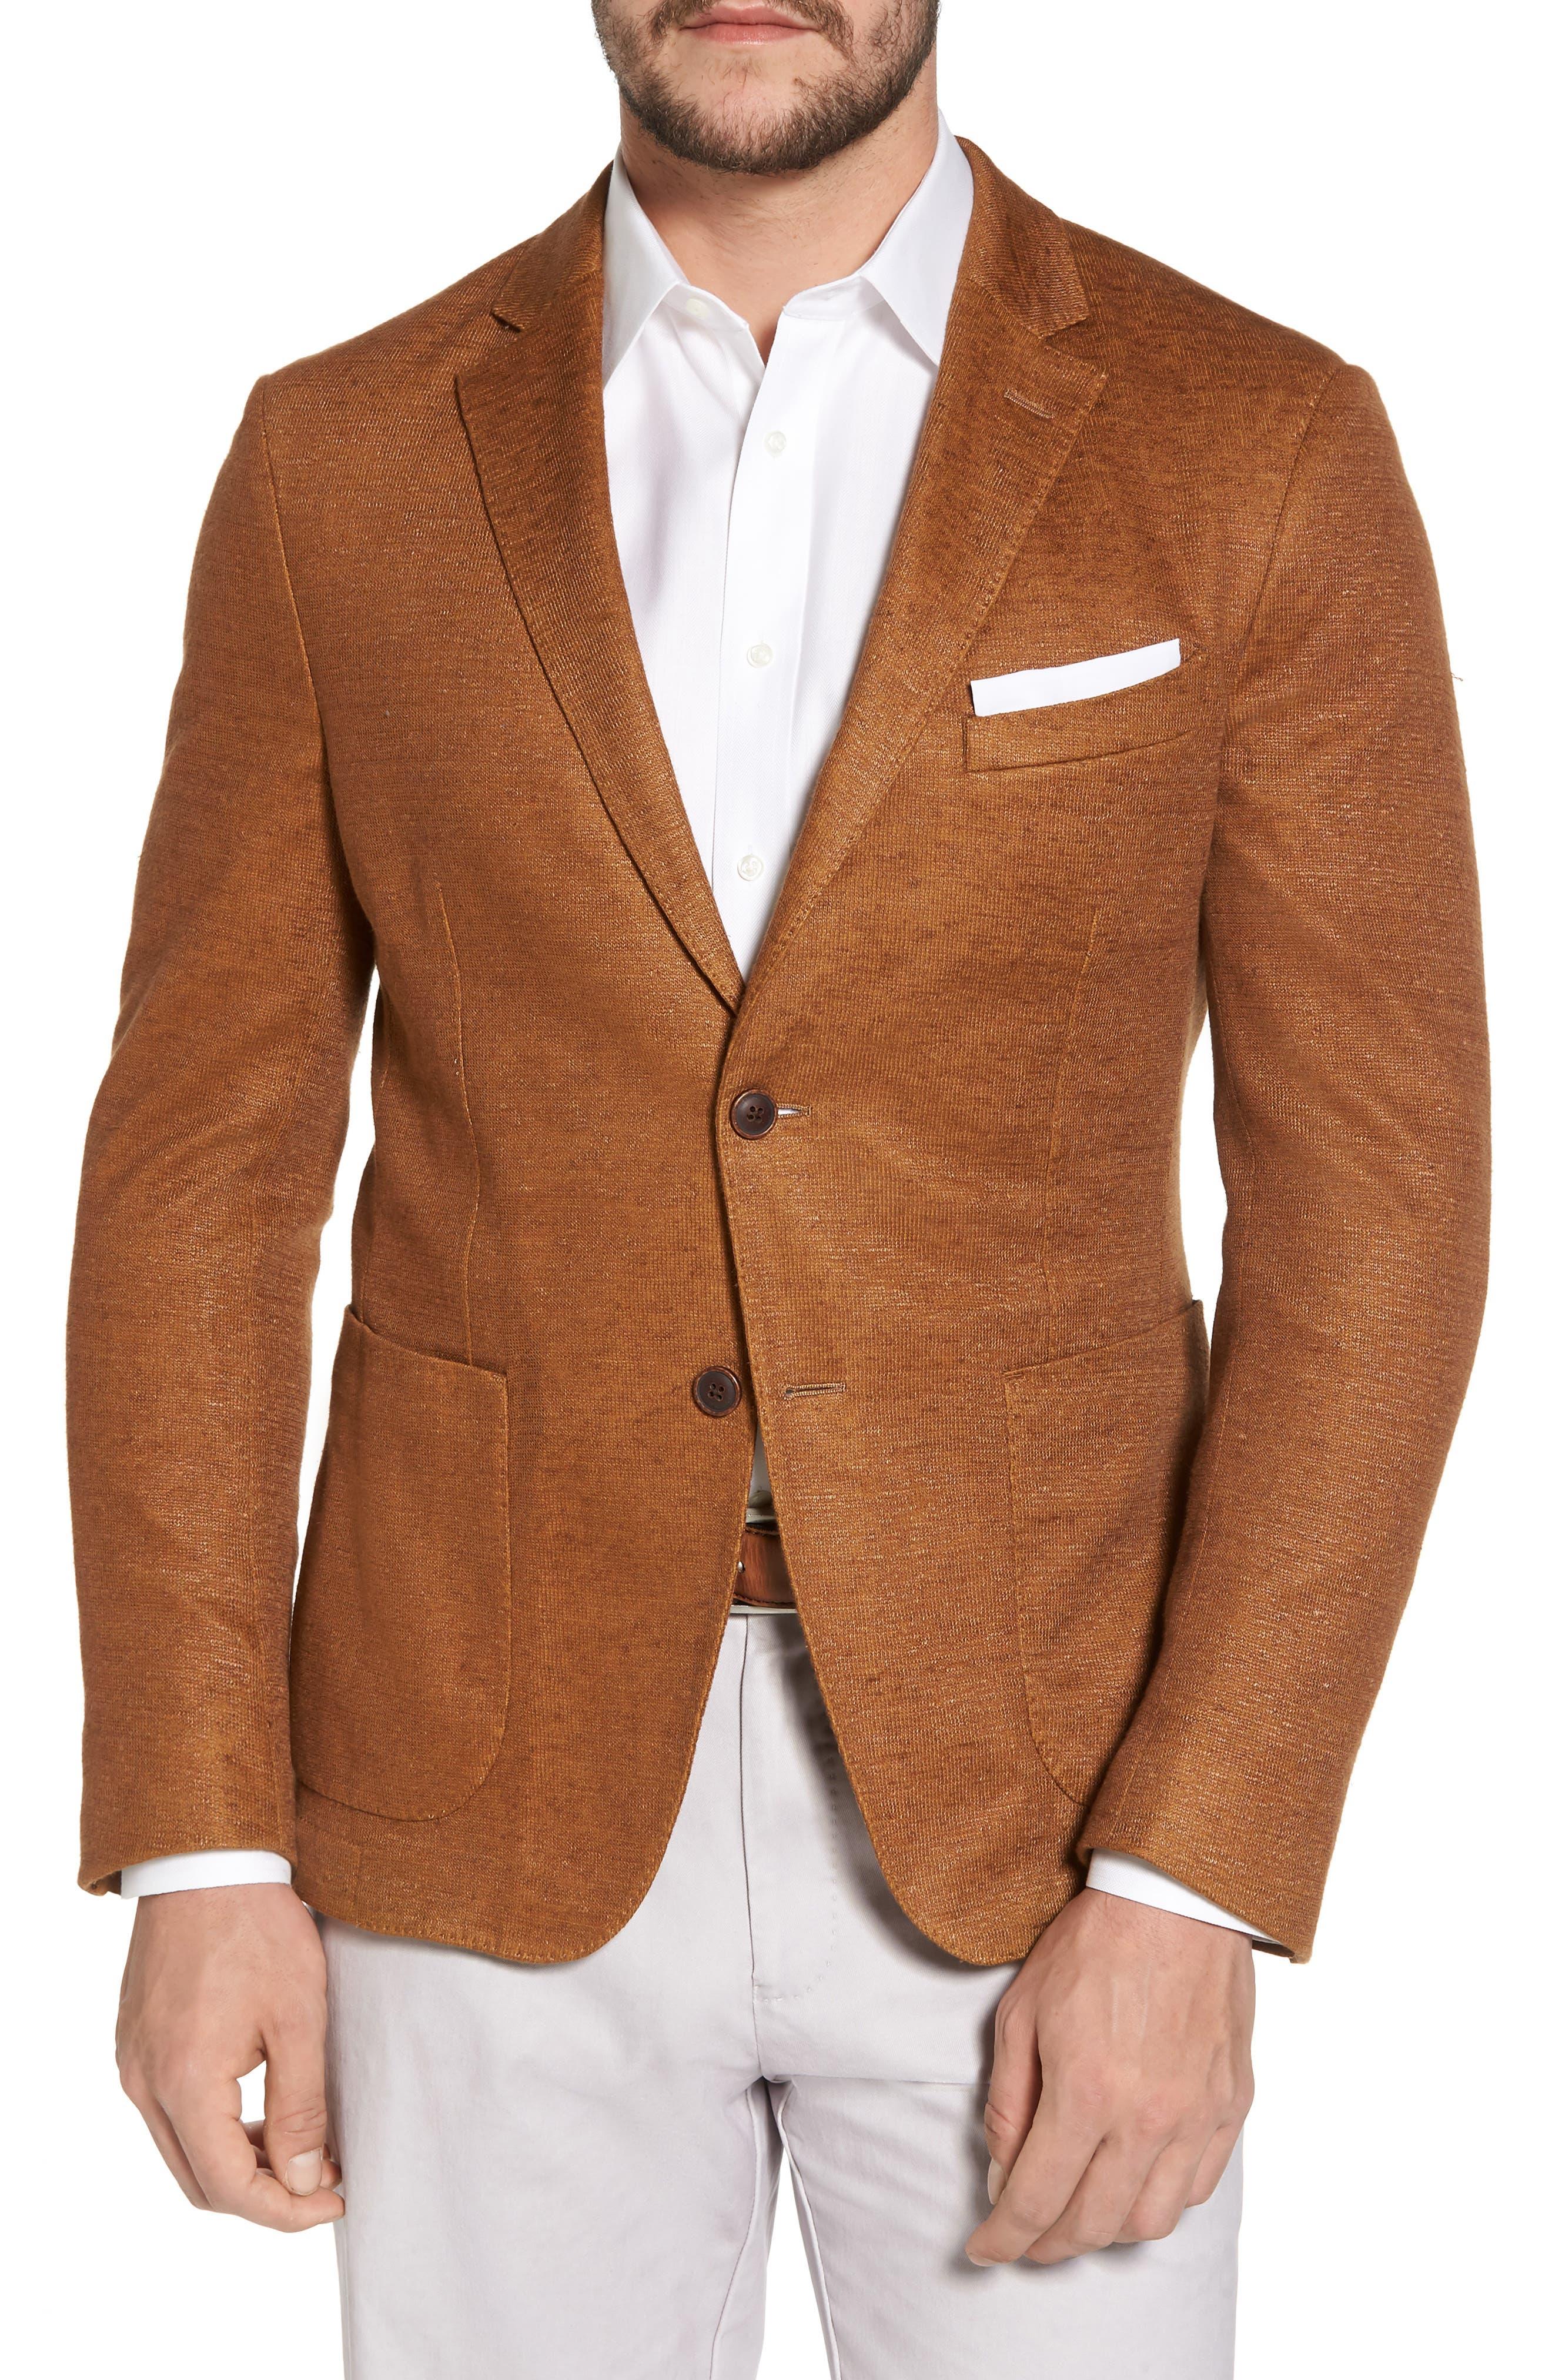 Trim Fit Heathered Jersey Blazer,                             Main thumbnail 1, color,                             Burnt Sienna